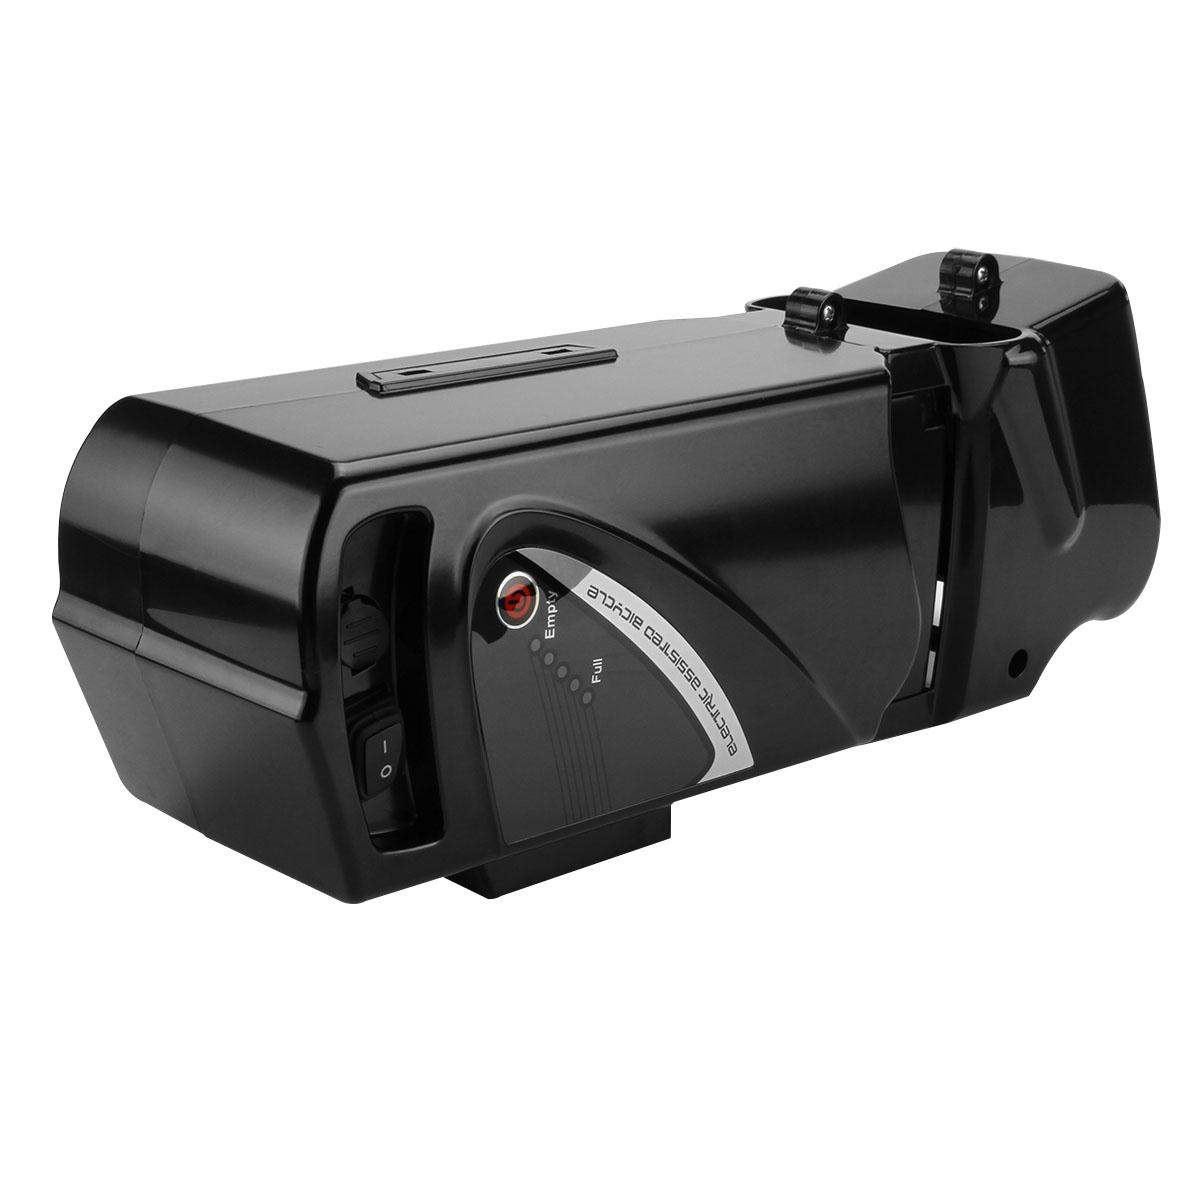 48V 10.2Ah E-bike Battery with Panasonic NCR18650B cell